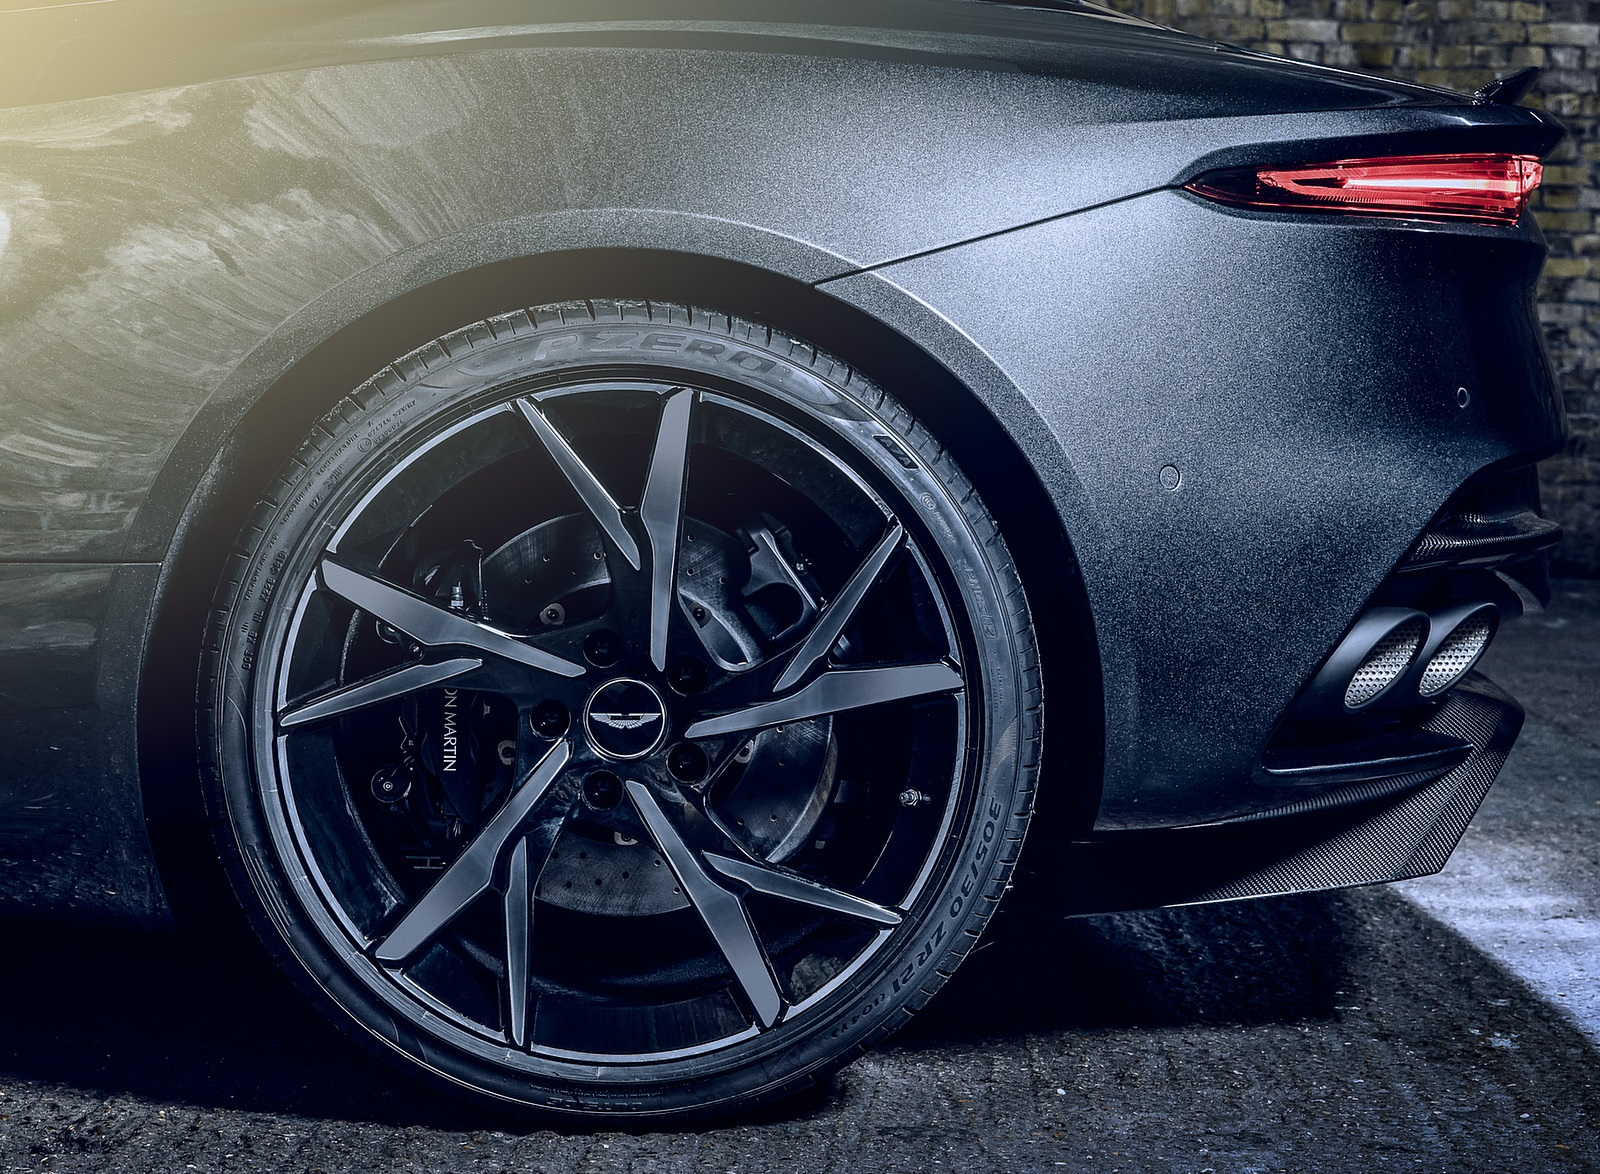 2021 Aston Martin DBS Superleggera 007 Edition Wheel Wallpapers (6)